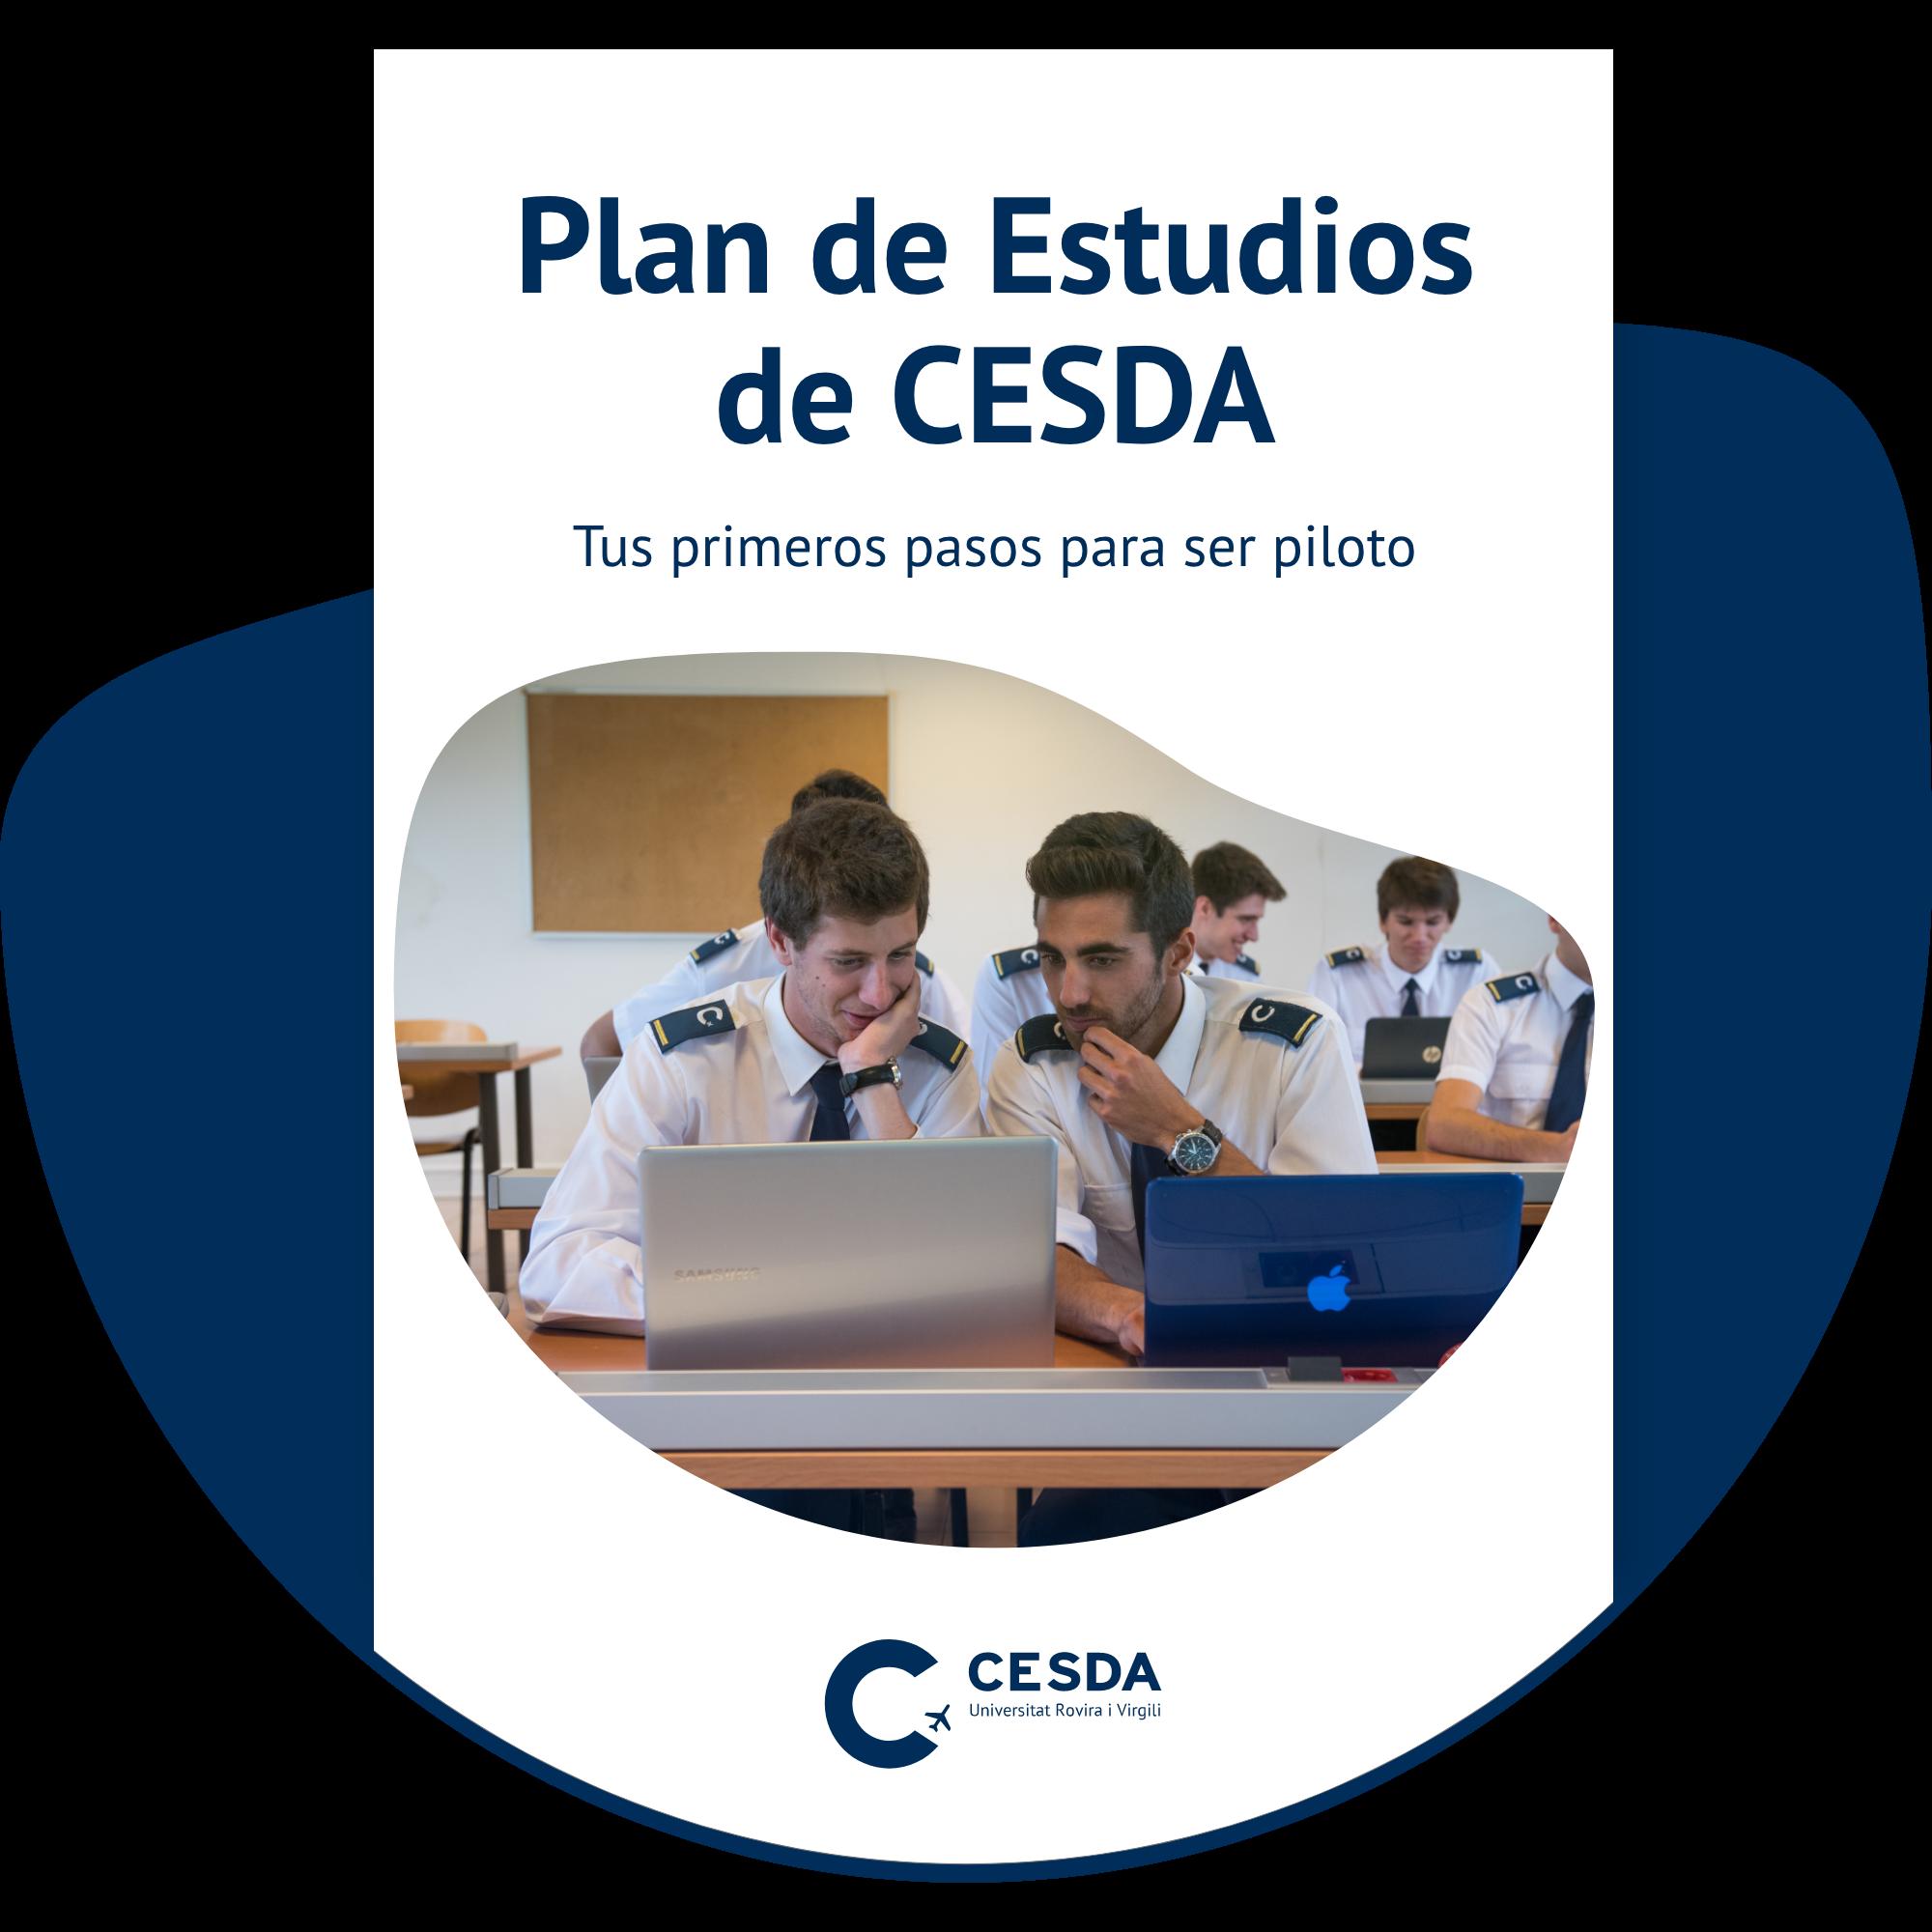 Plan de Estudios de CESDA